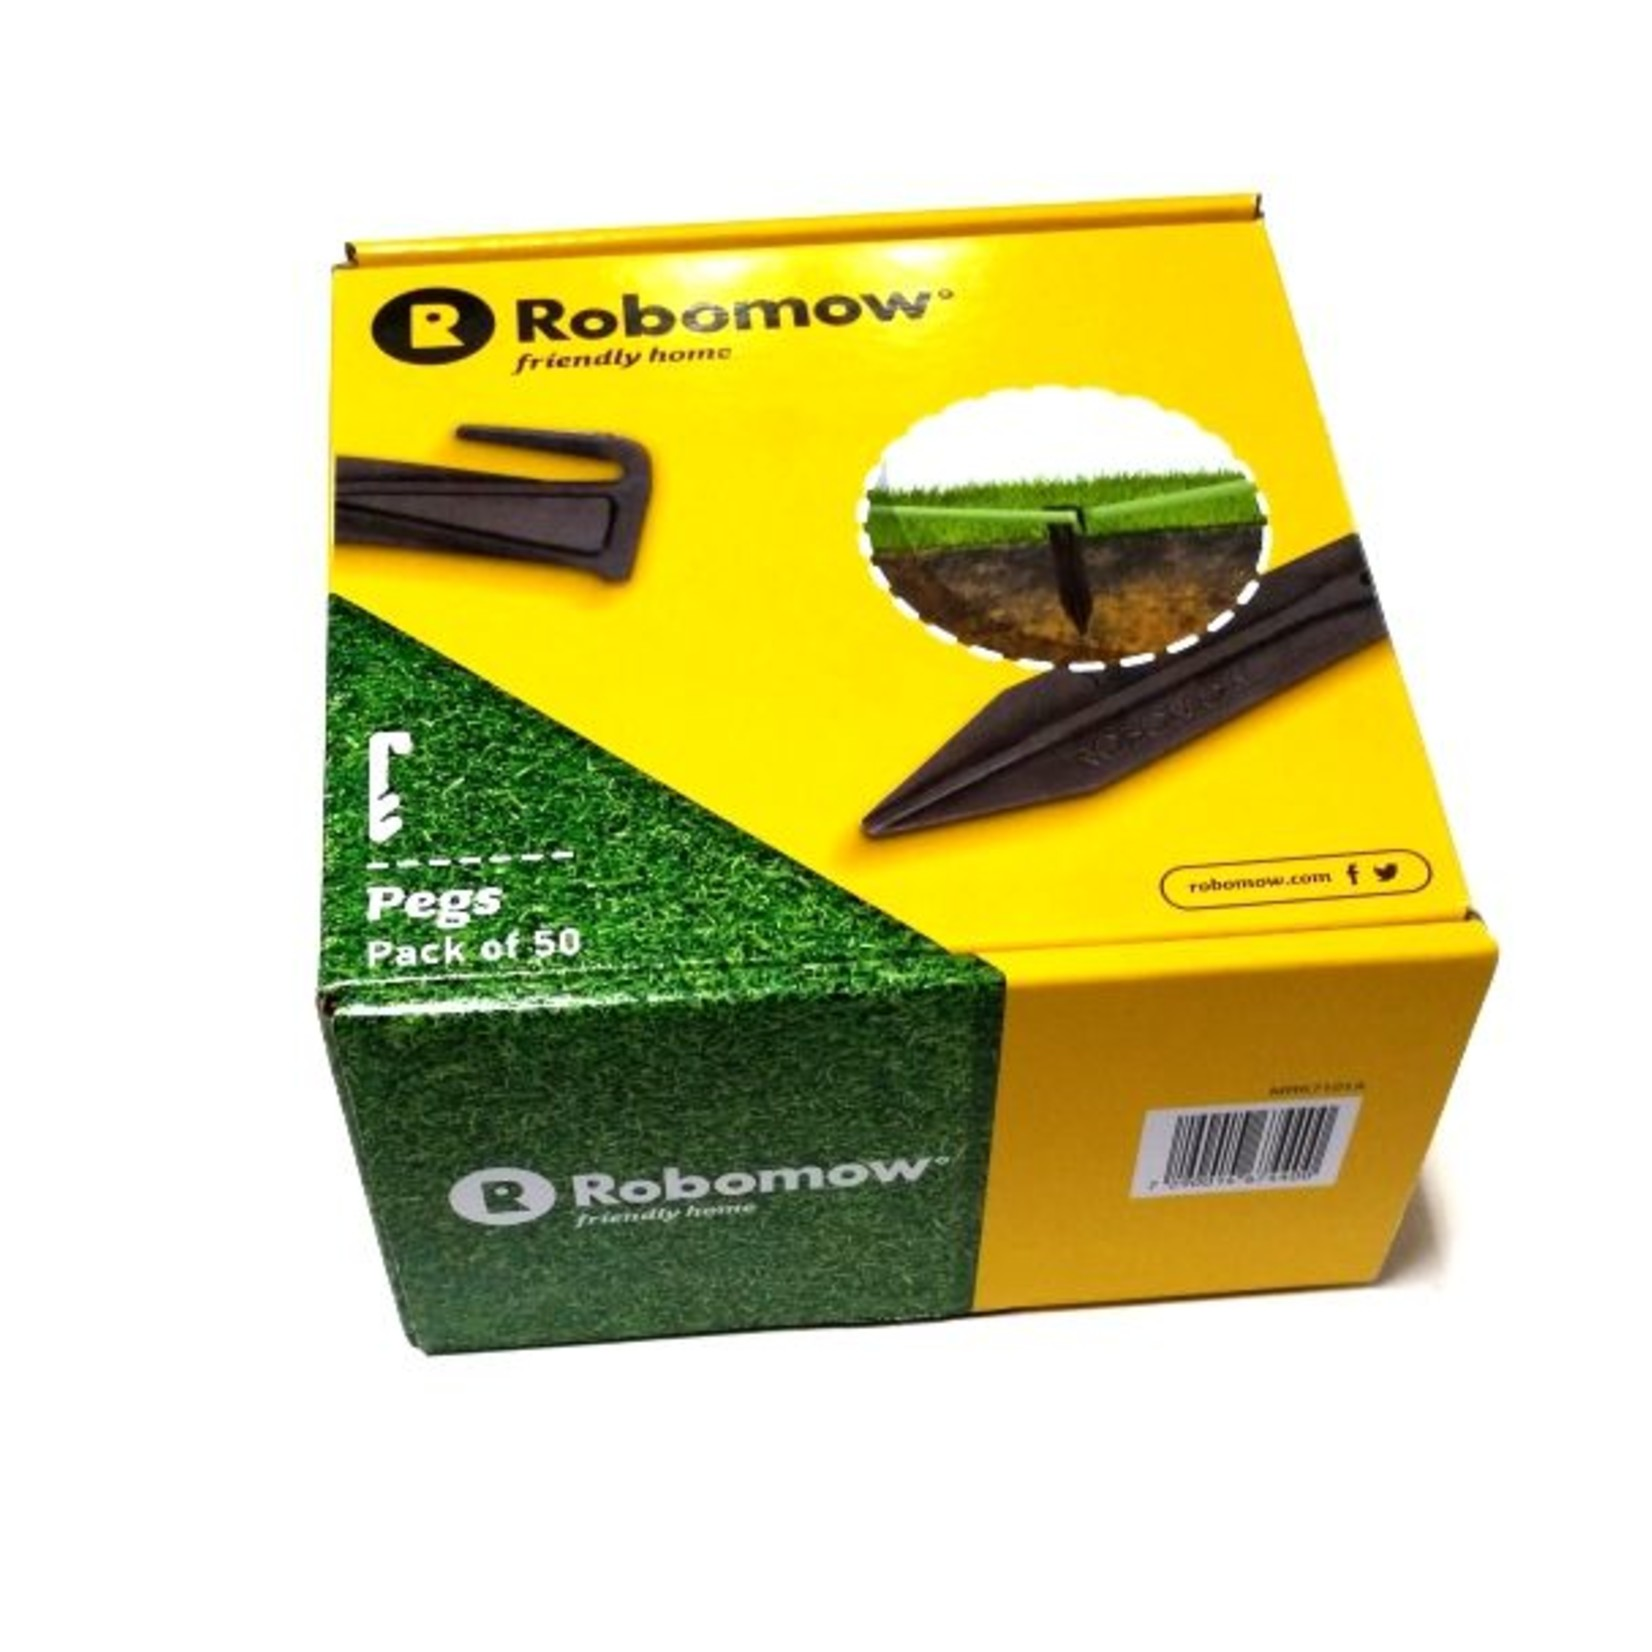 Robomow Robomow Rasennägel (Kabelhaken) 50 Stück  MRK7101A